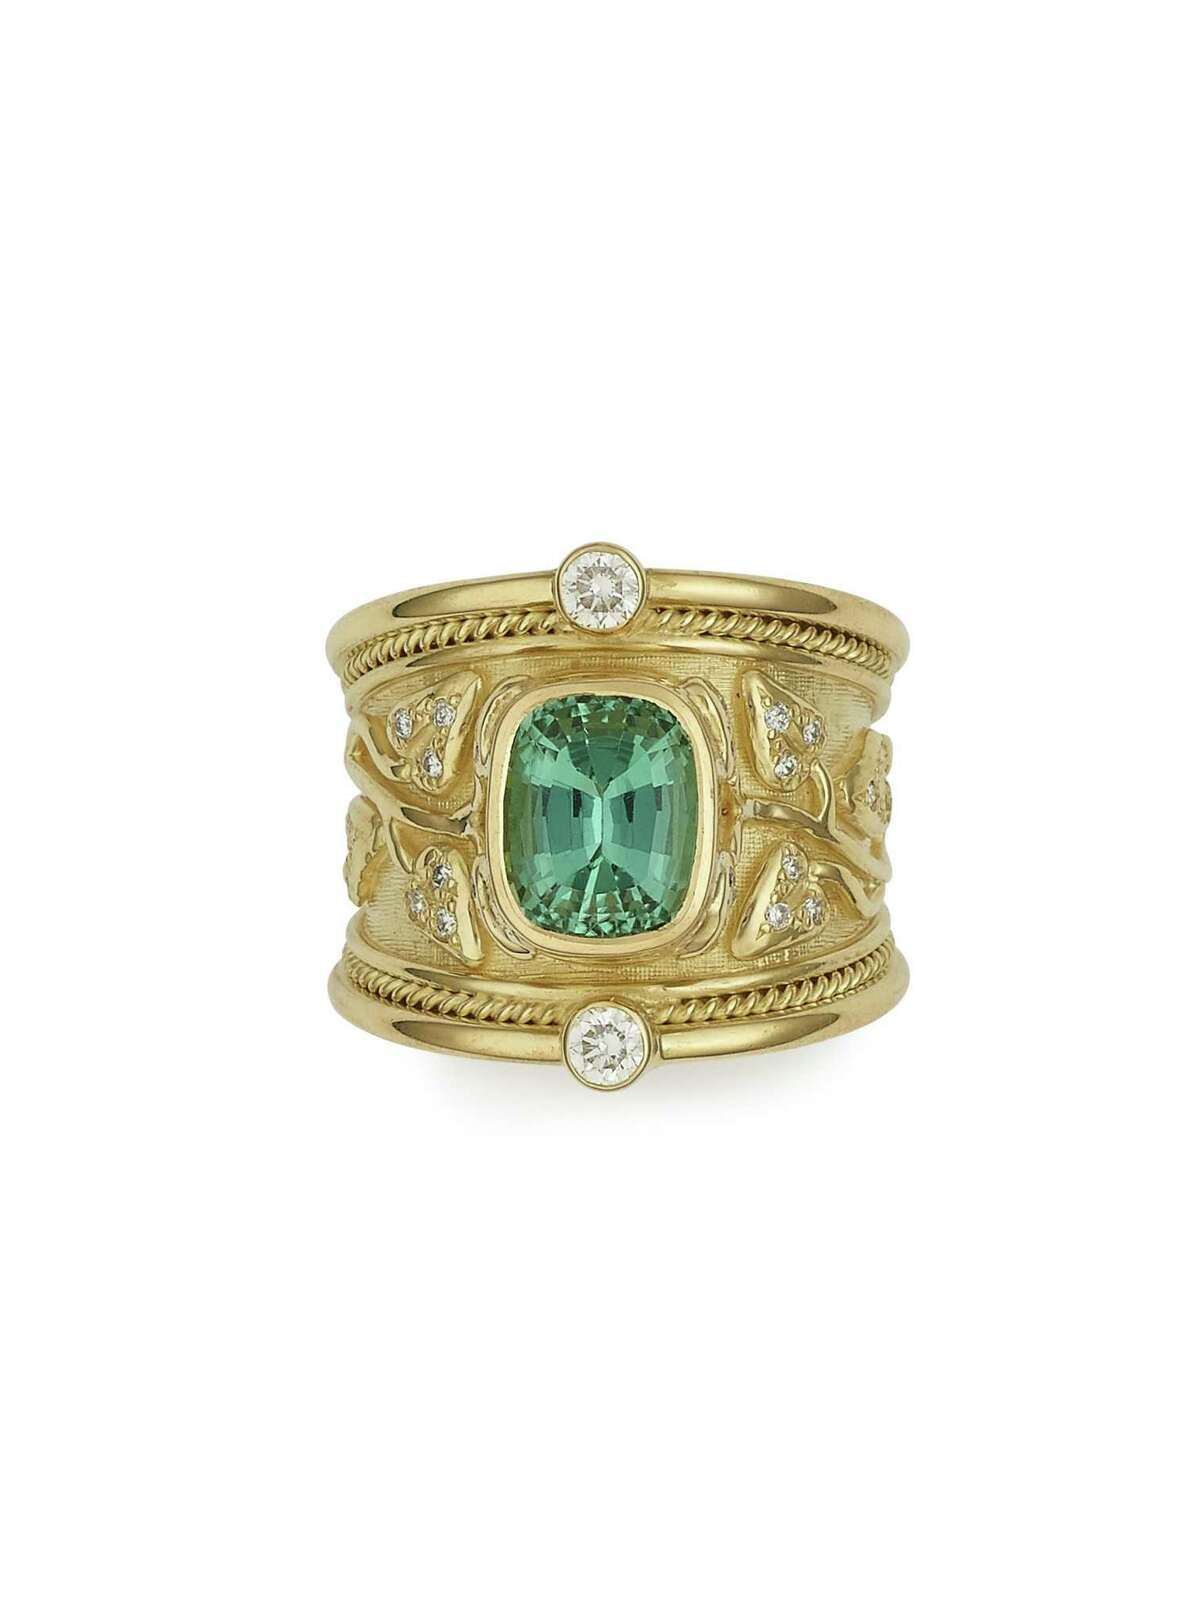 Elizabeth Gage green tourmaline tapered templar ring, $16,200